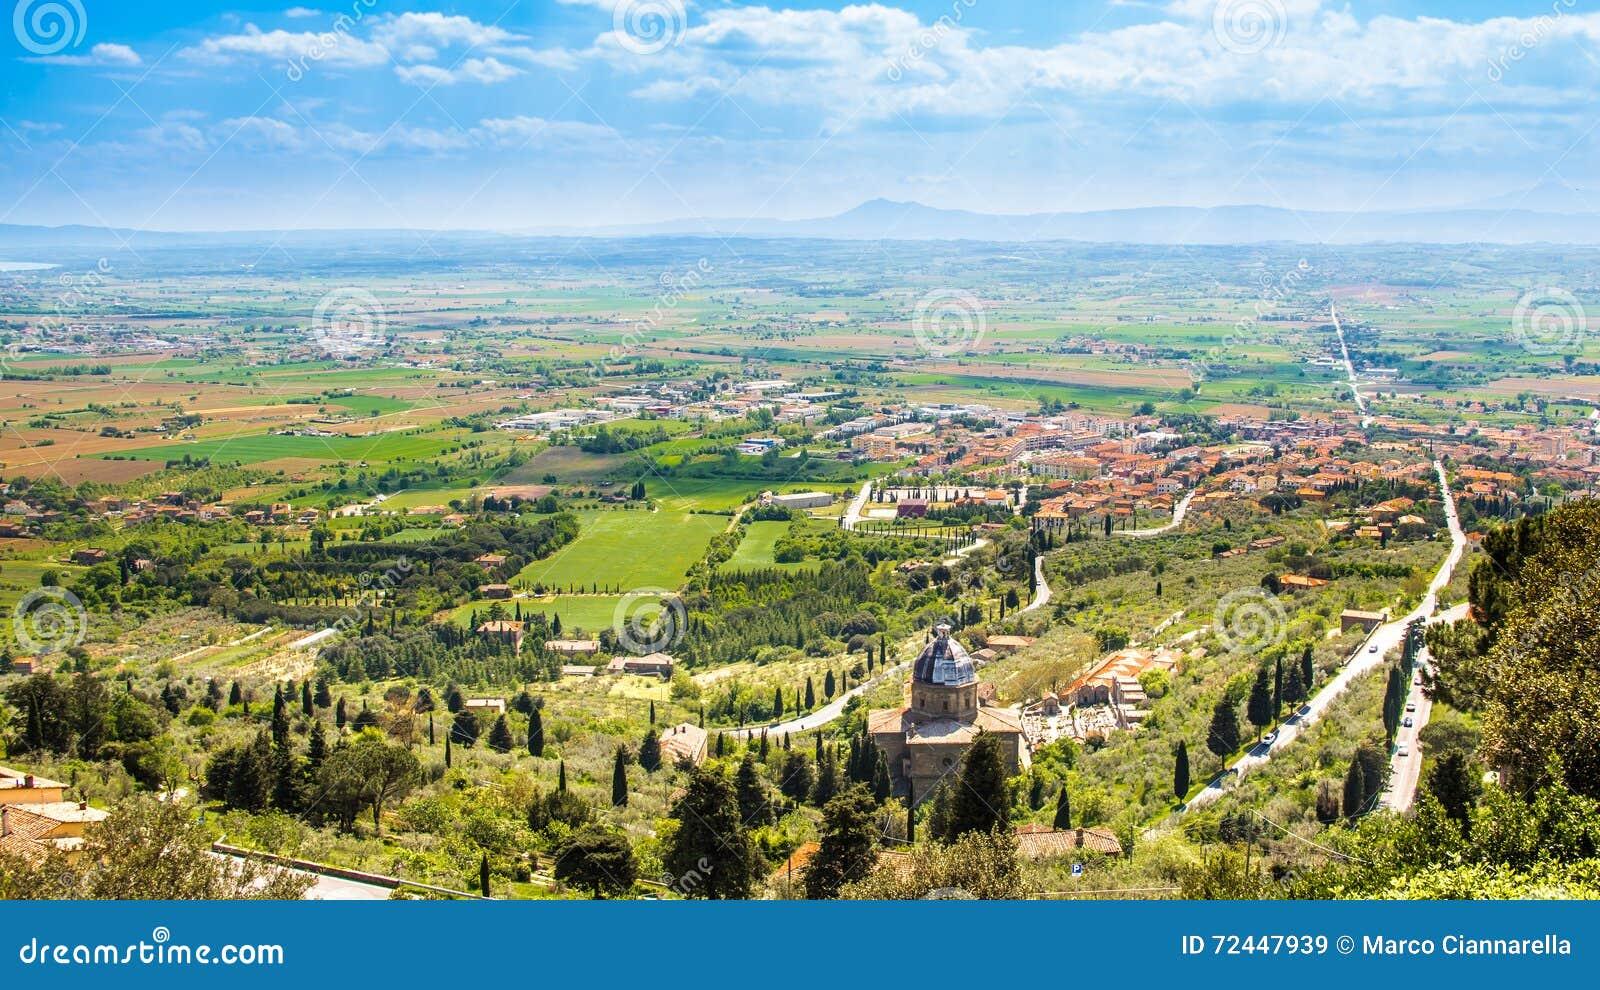 Val di Chiana, ein alluviales Tal in Toskana, Italien